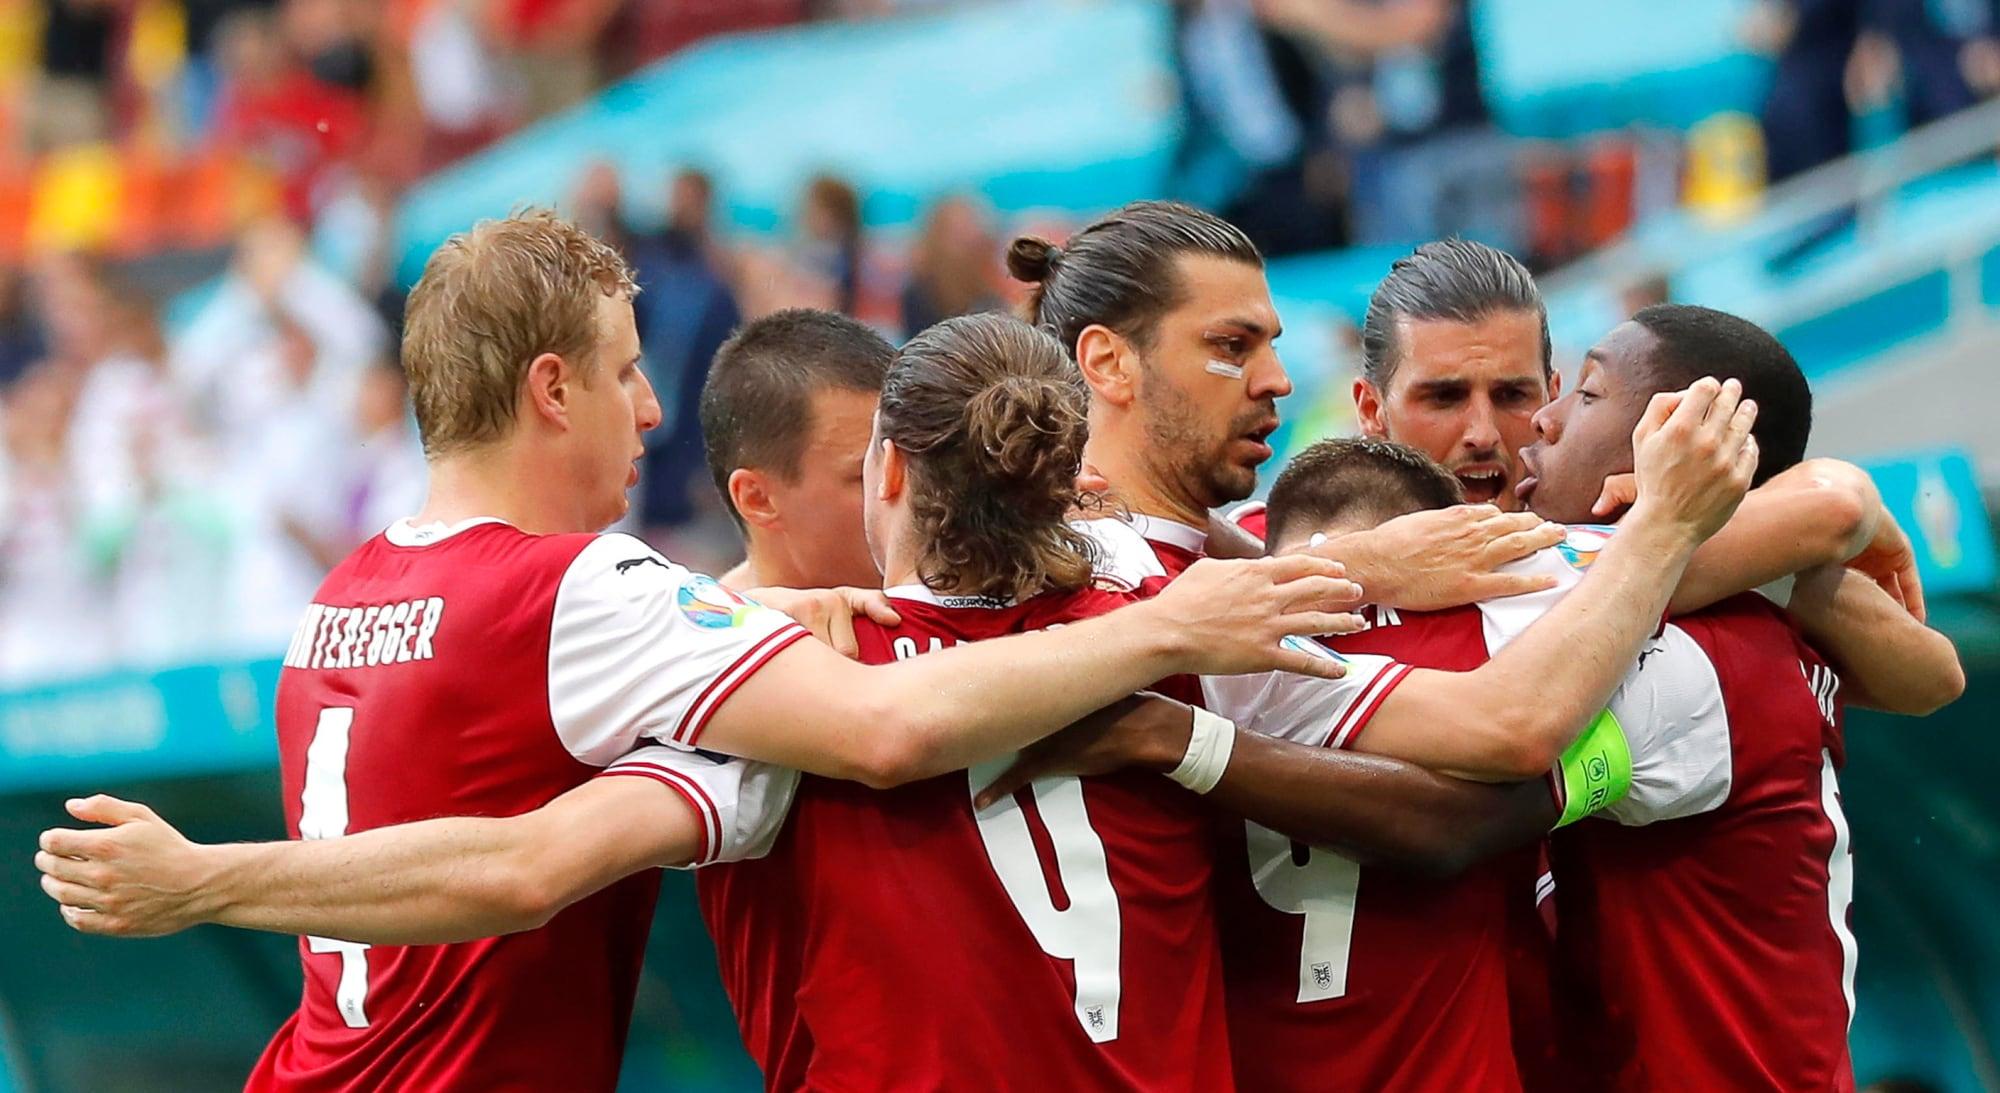 Sarà l'Austria a sfidare l'Italia agli ottavi: ko l'Ucraina di Shevchenko